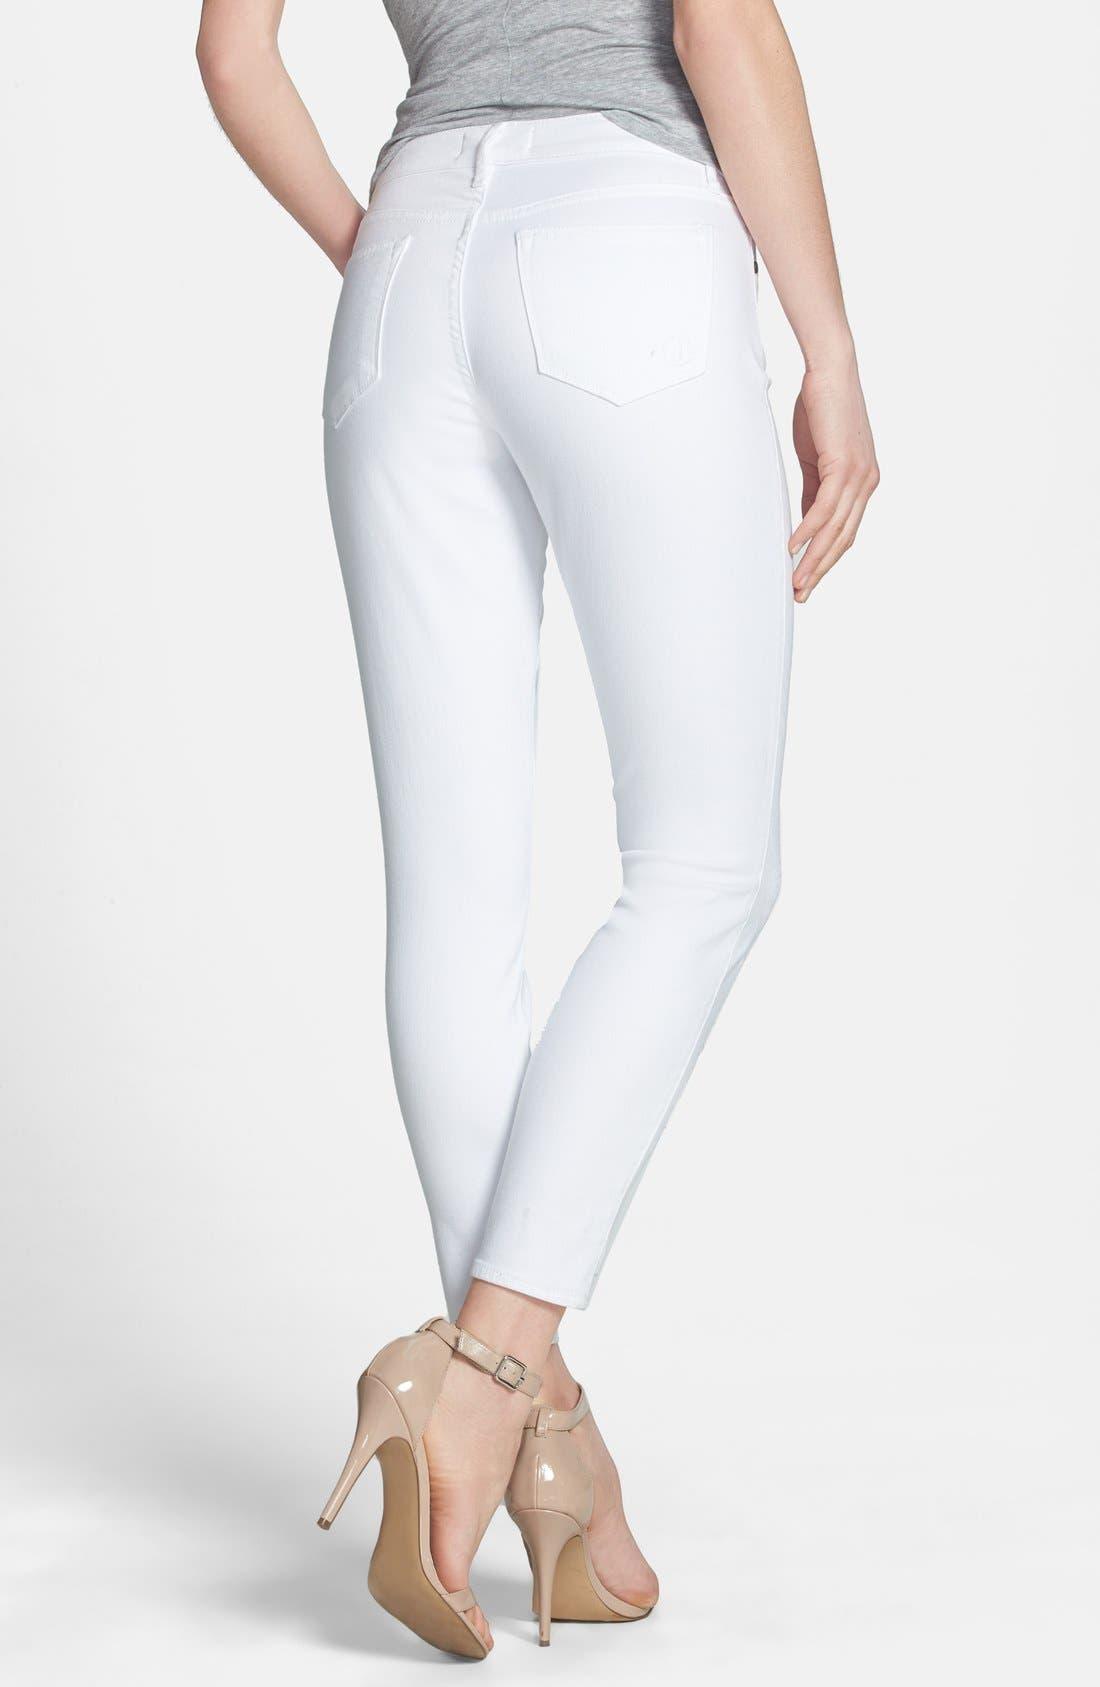 Alternate Image 2  - CJ by Cookie Johnson 'Wisdom' Eyelet Detail Ankle Skinny Jeans (Optic White)